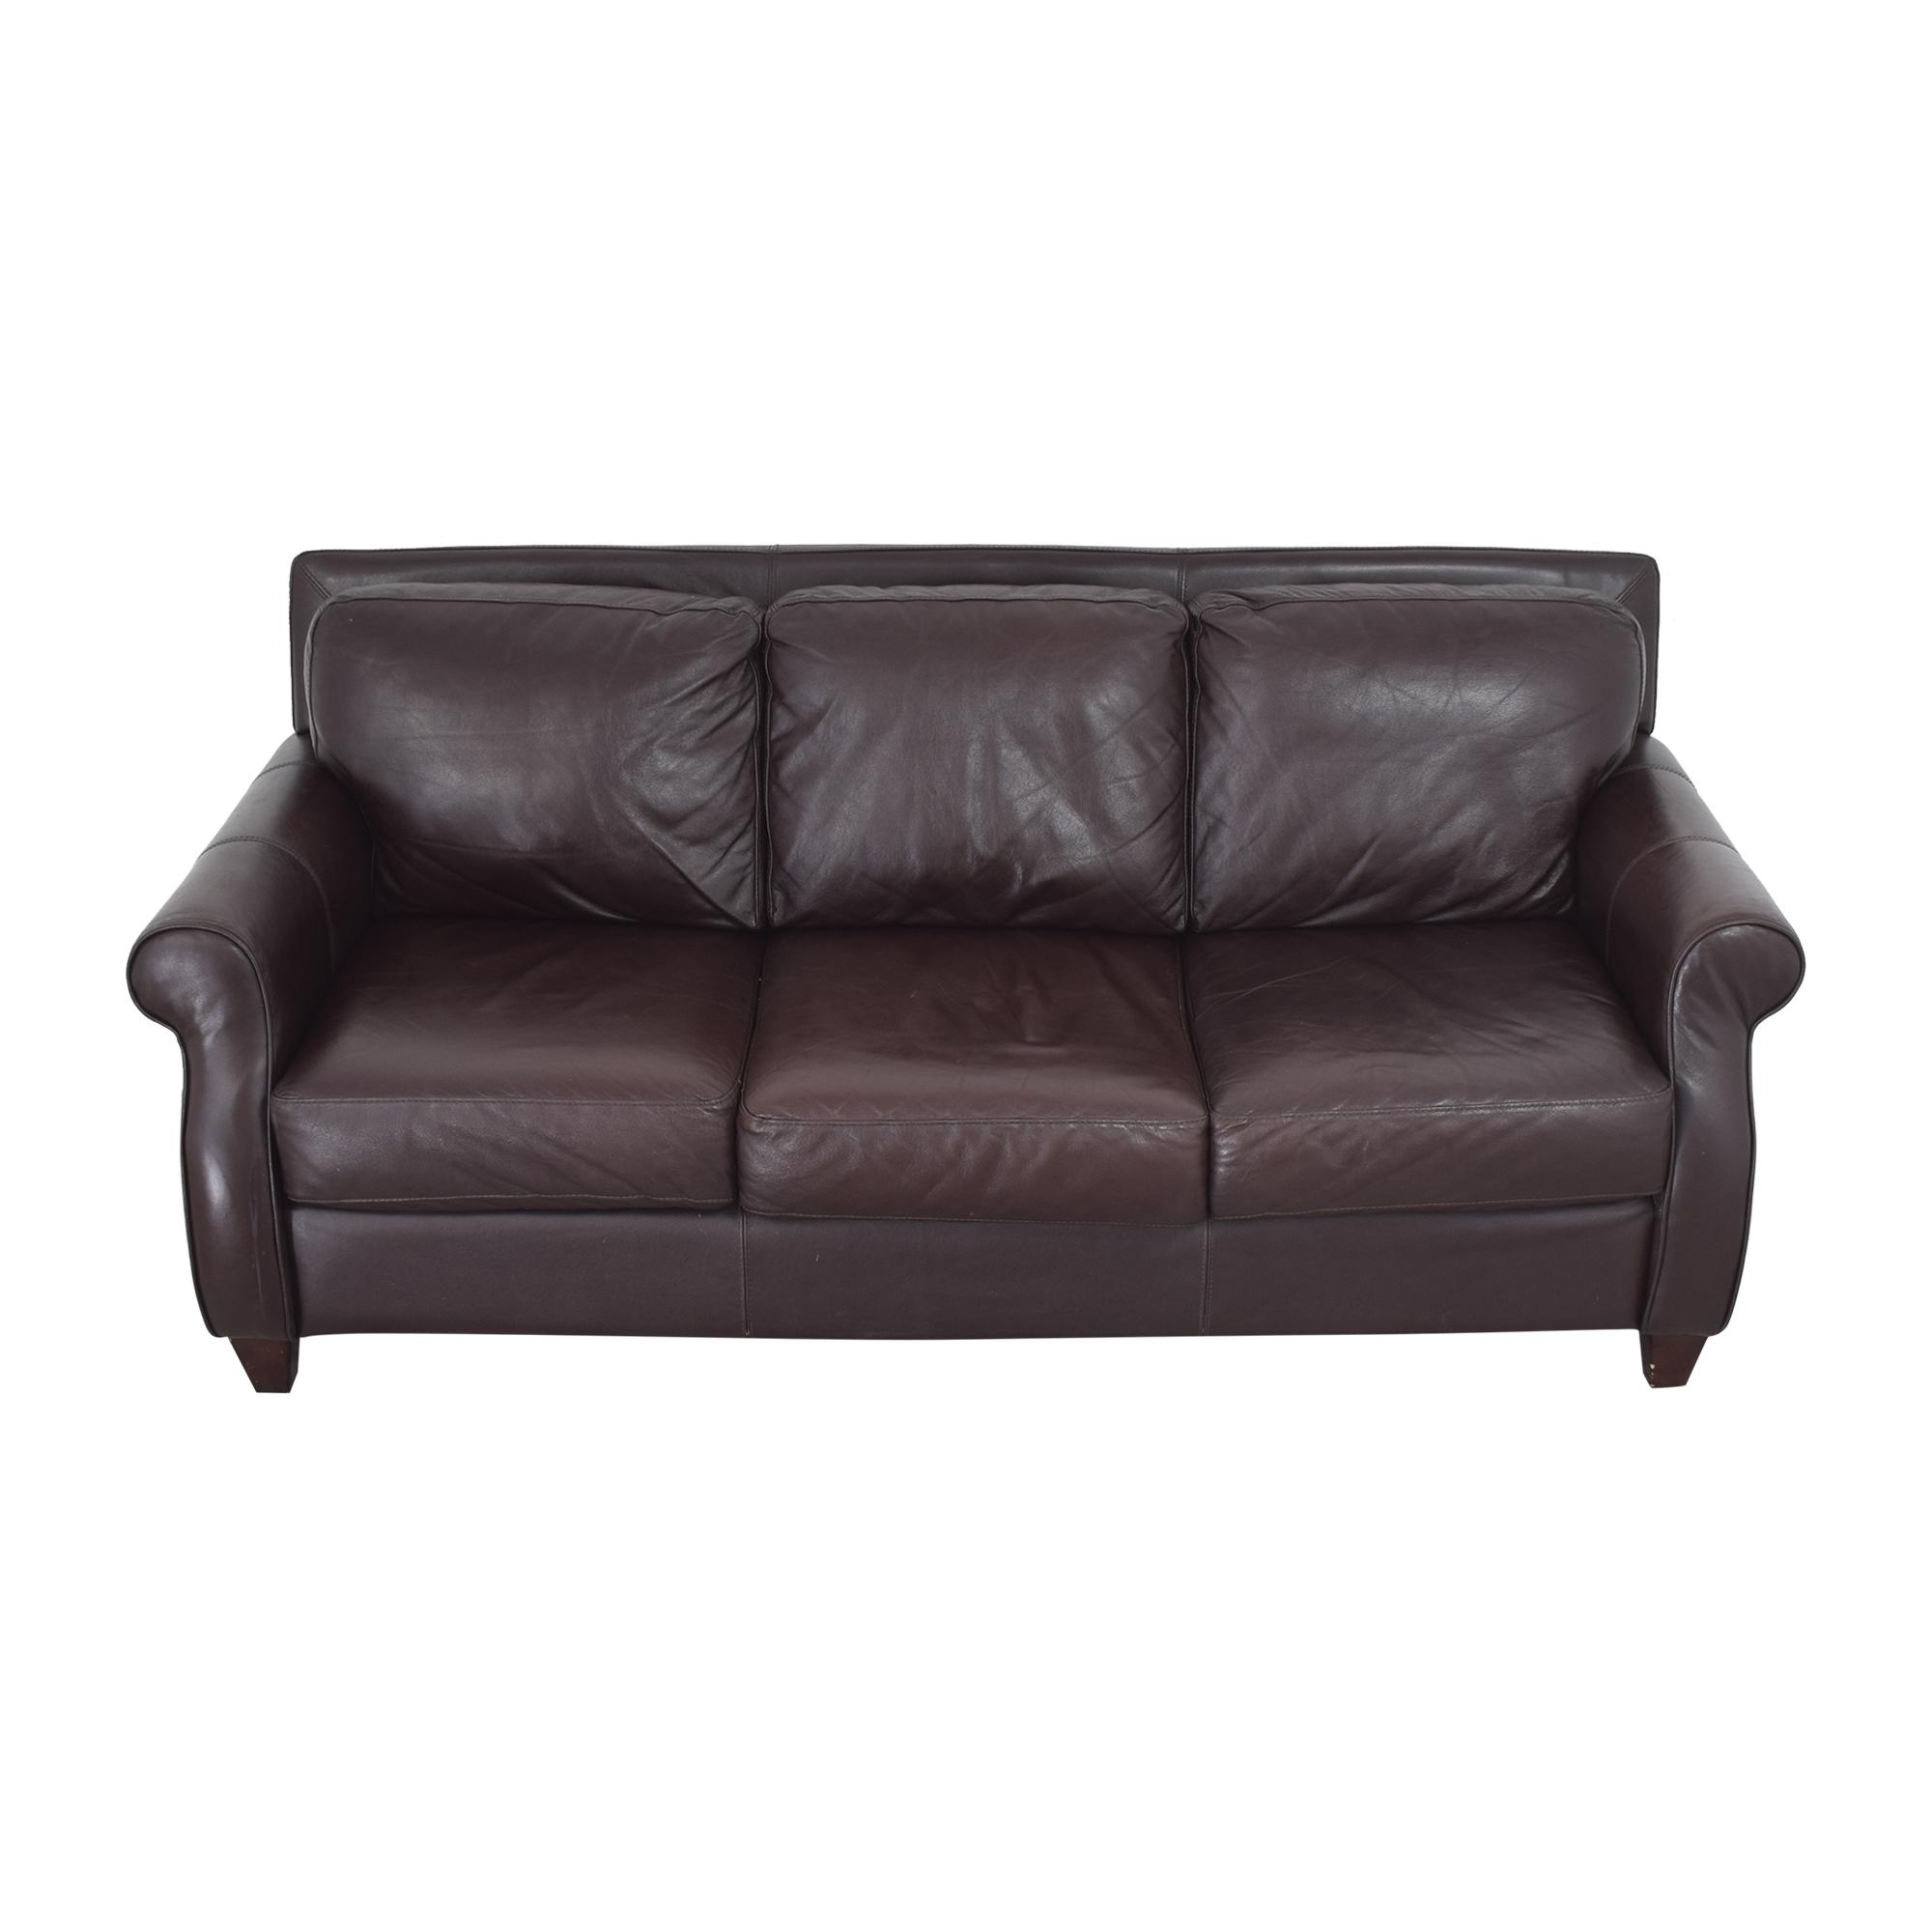 shop Raymour & Flanigan Three Cushion Sofa Raymour & Flanigan